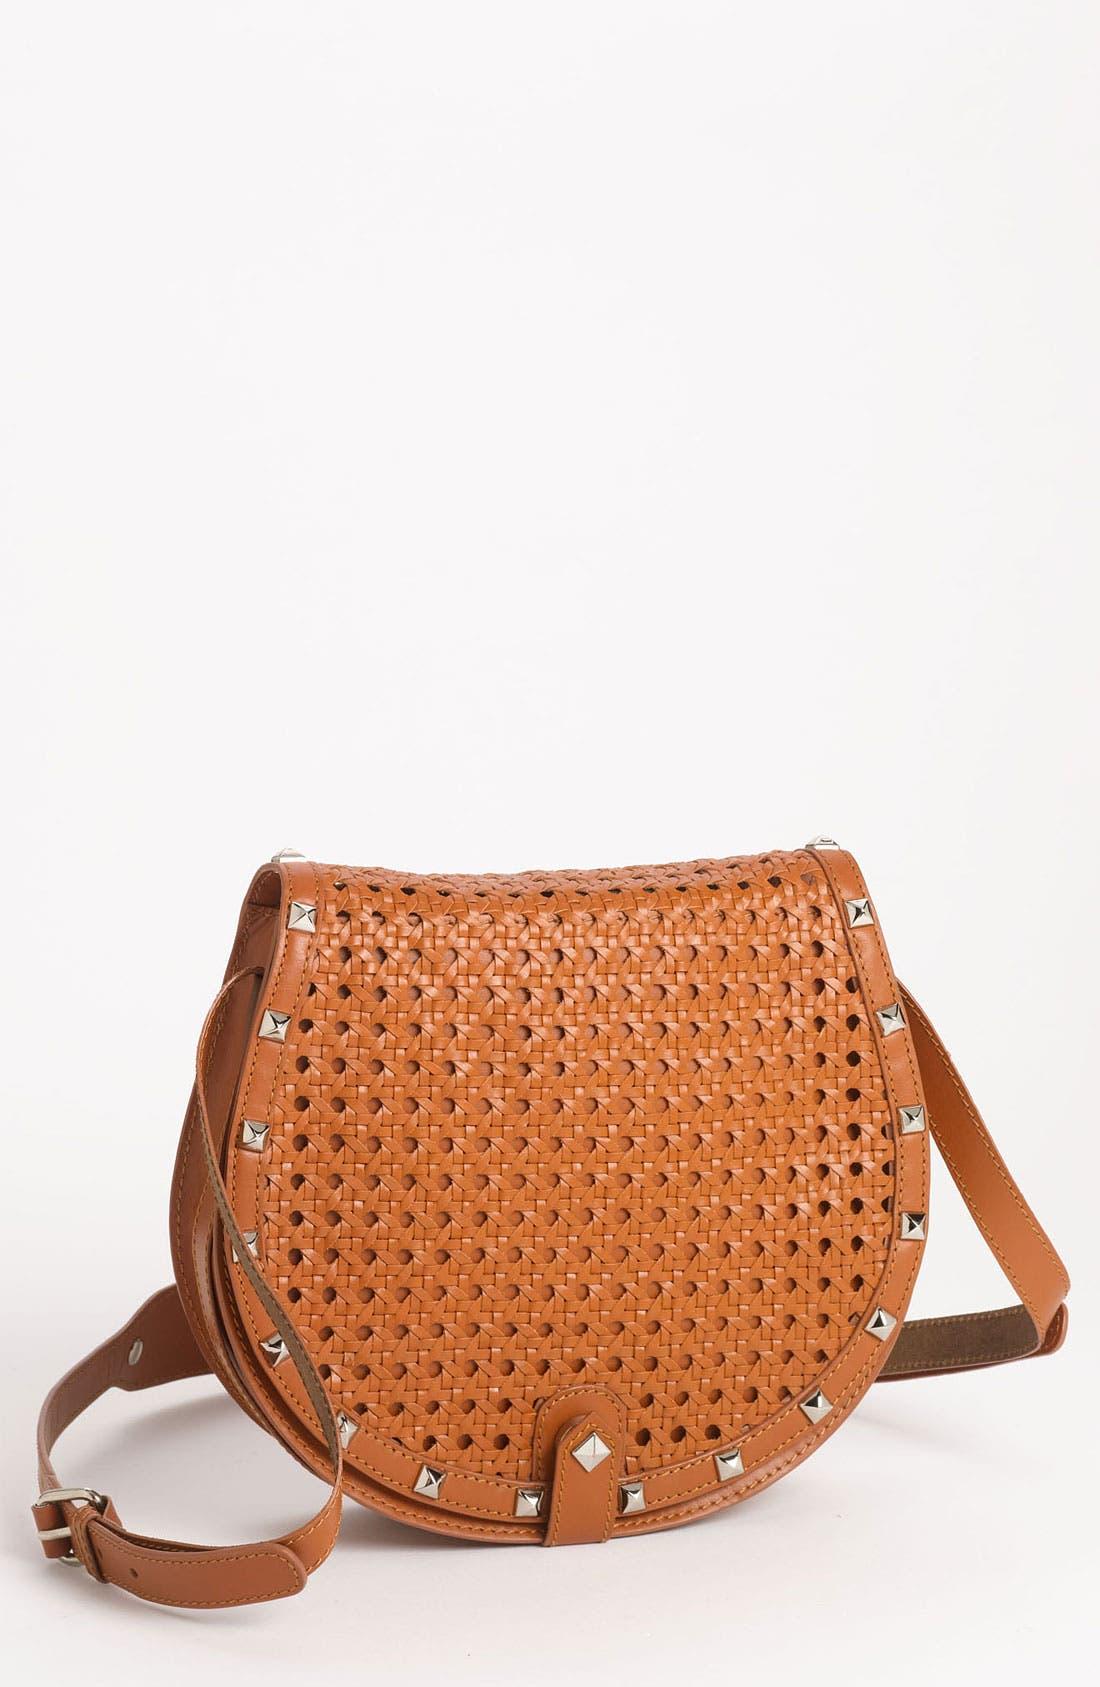 Alternate Image 1 Selected - Rebecca Minkoff 'Skylar - Wicker Woven' Leather Crossbody Bag